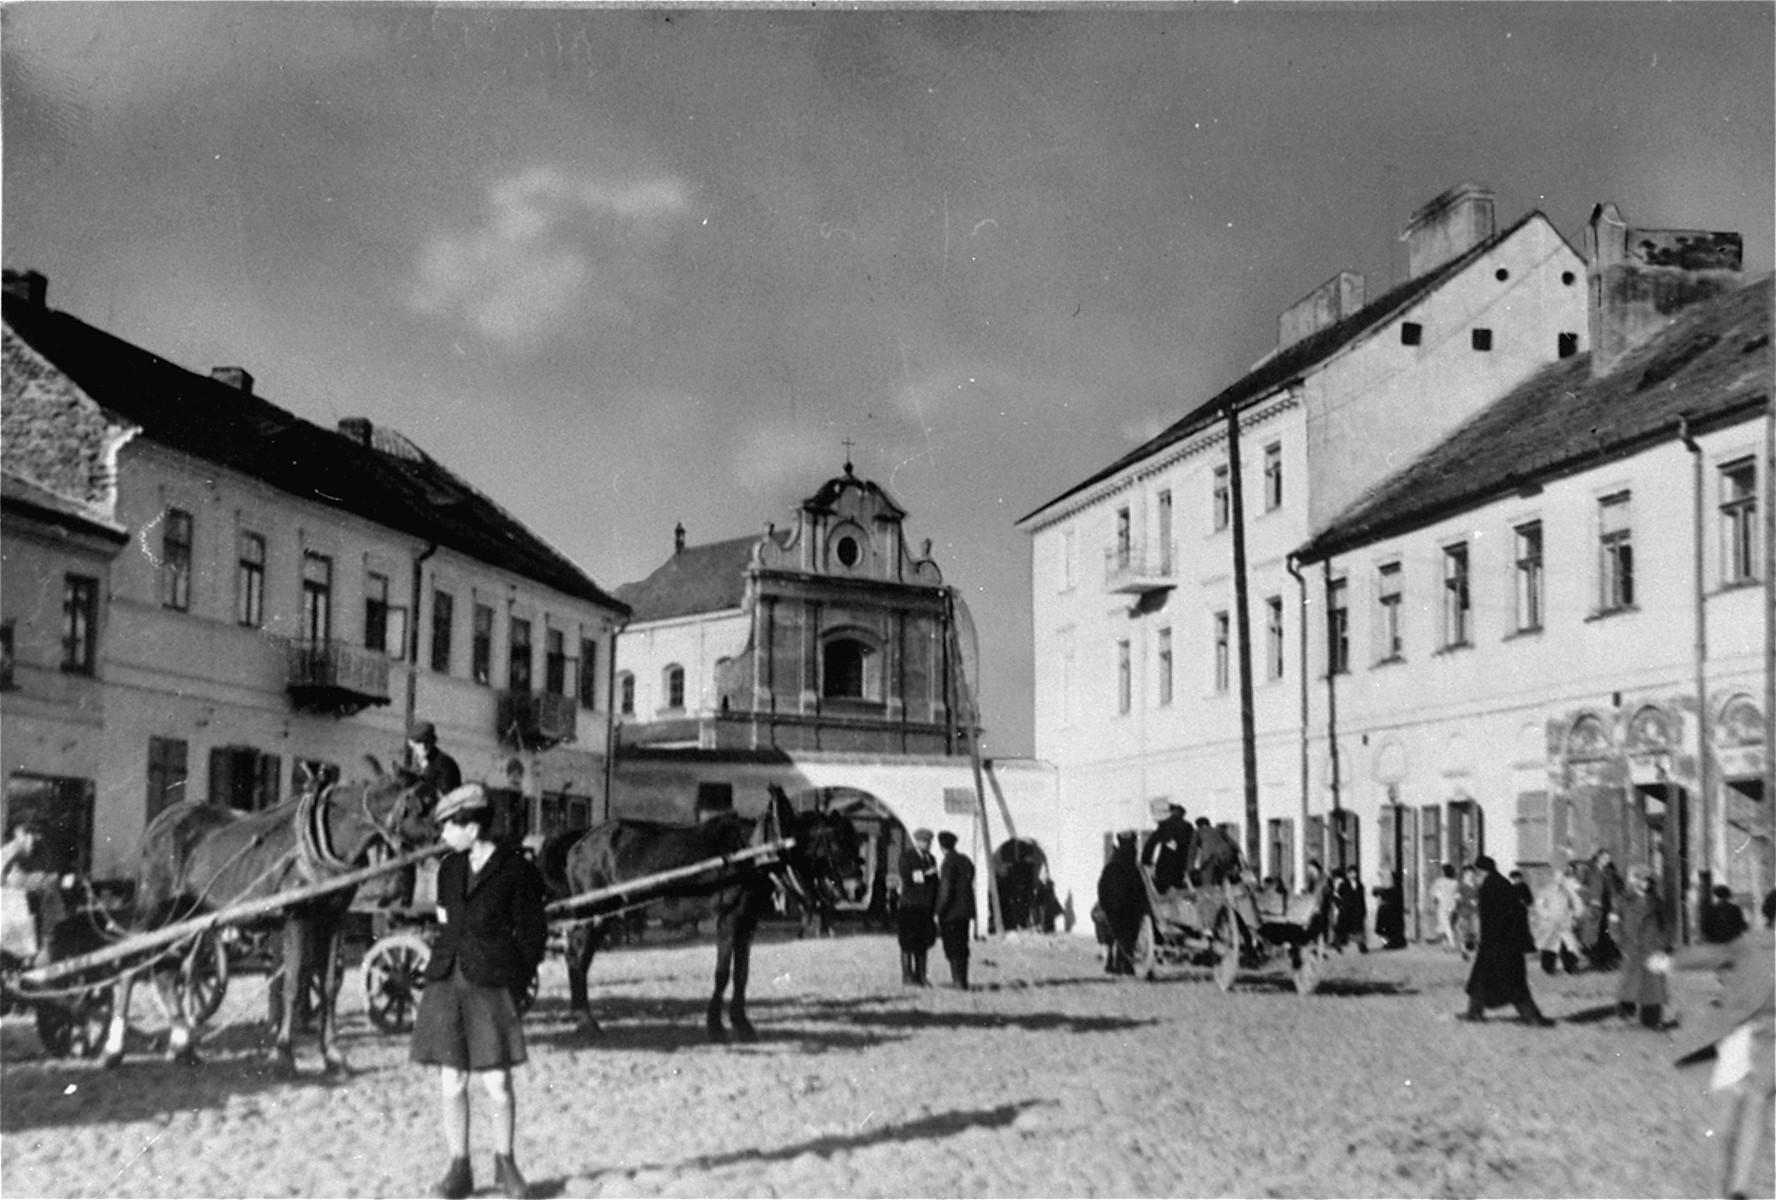 View of the main square of the ghetto in Radom.